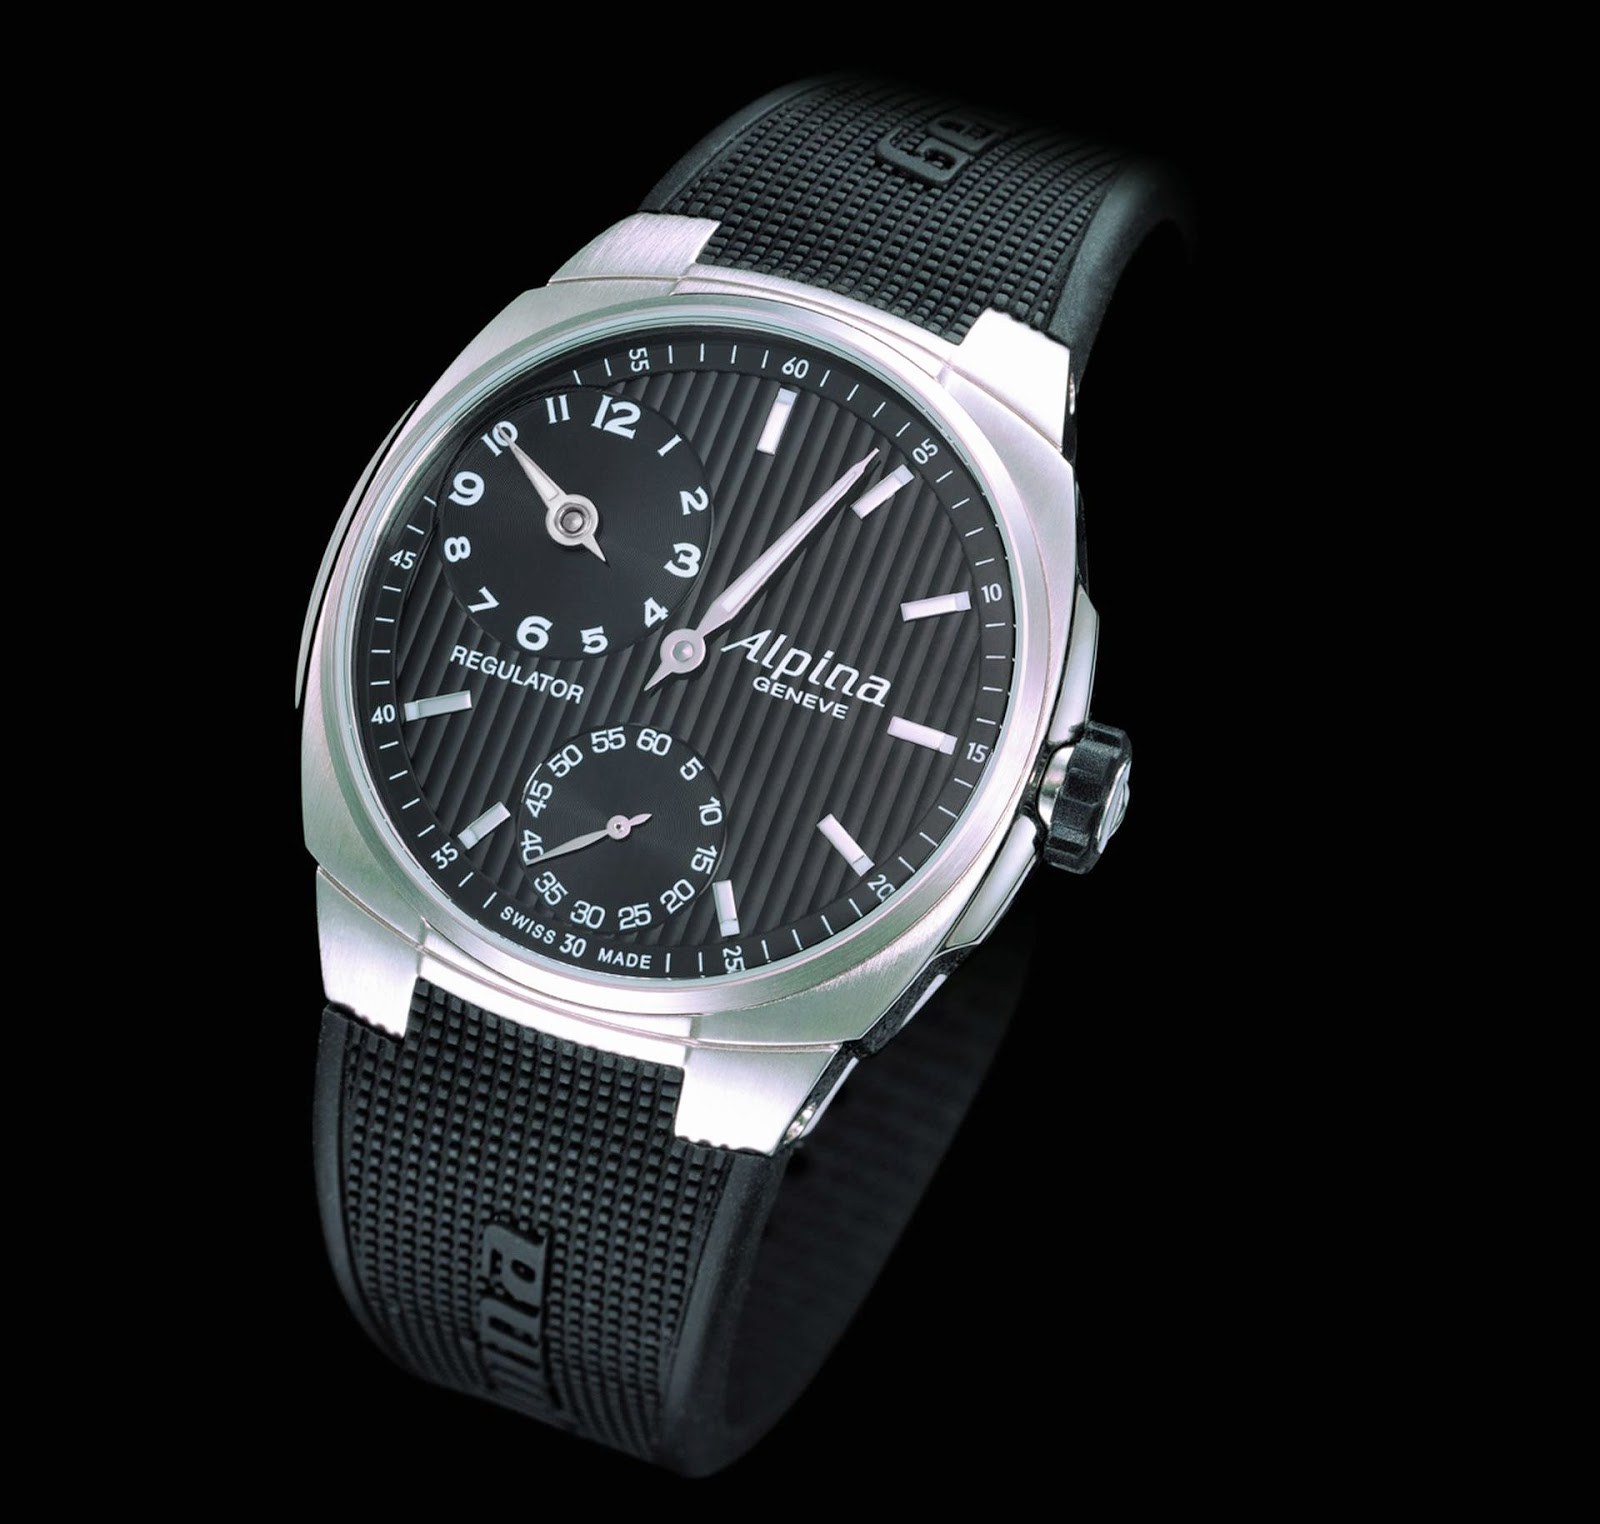 ALPINA Avalanche Régulateur watch